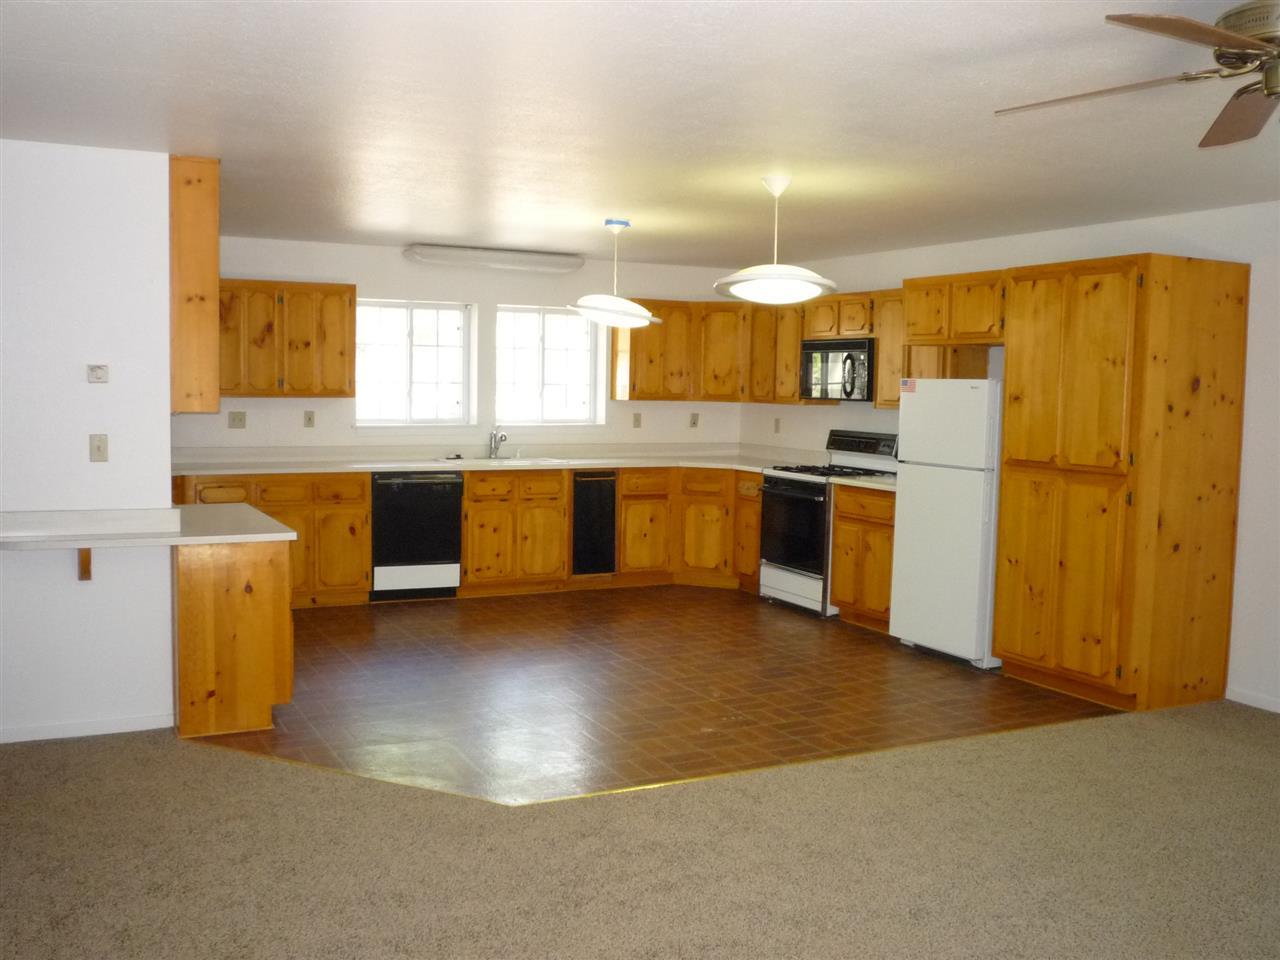 Additional photo for property listing at 708 Yeargin Drive 708 Yeargin Drive Portola, California 96122 Estados Unidos